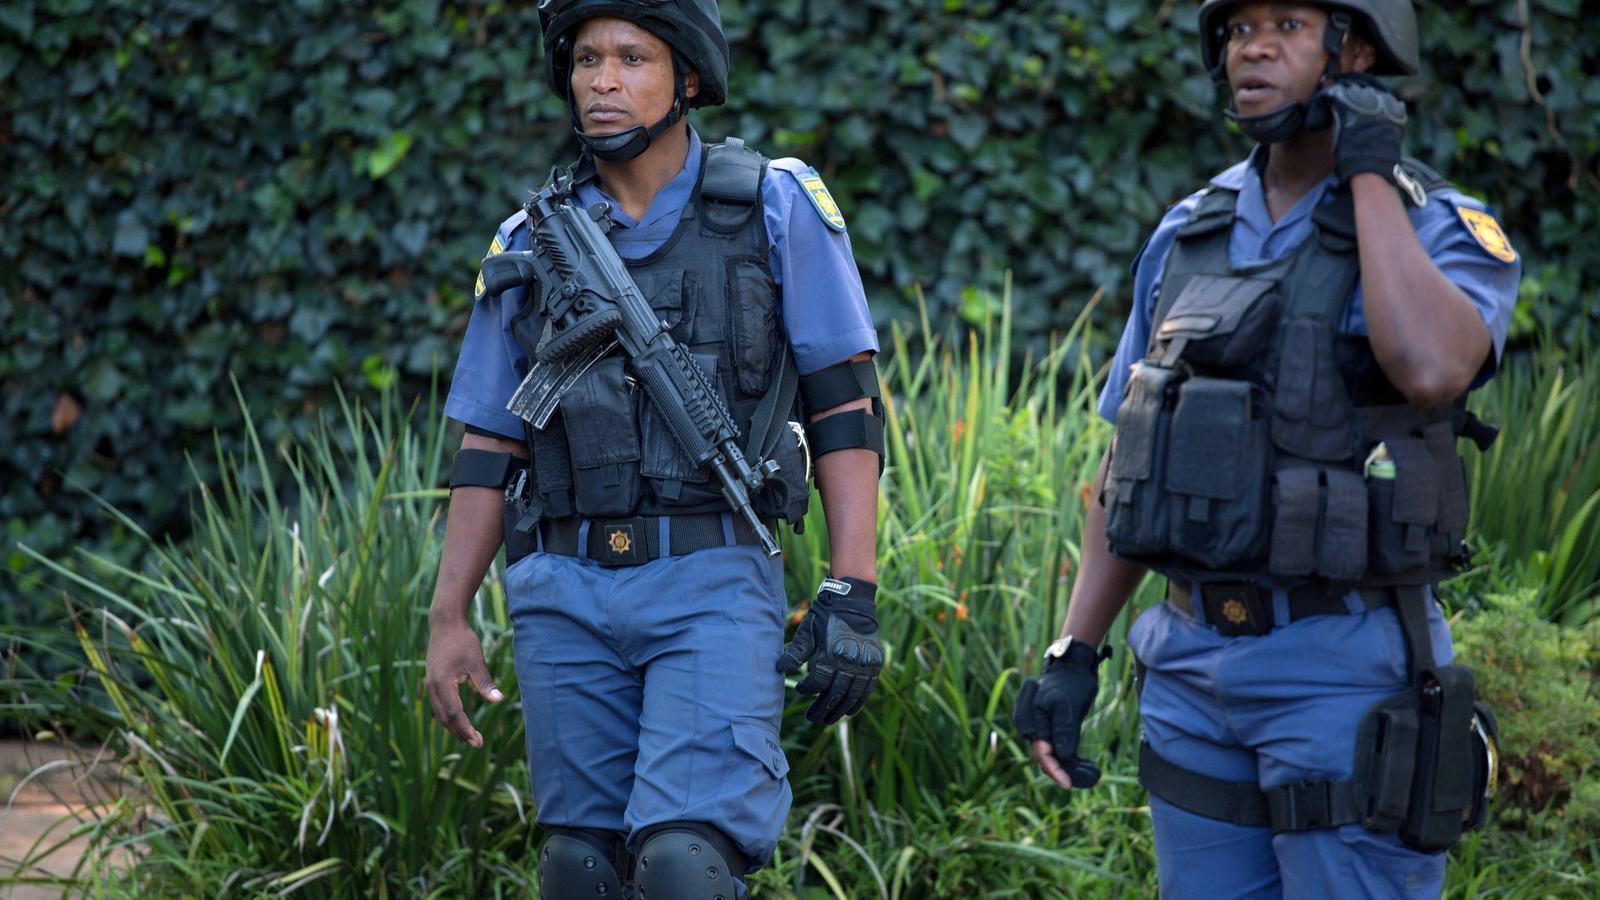 Dos policies sud-africans es despleguen per un cas.